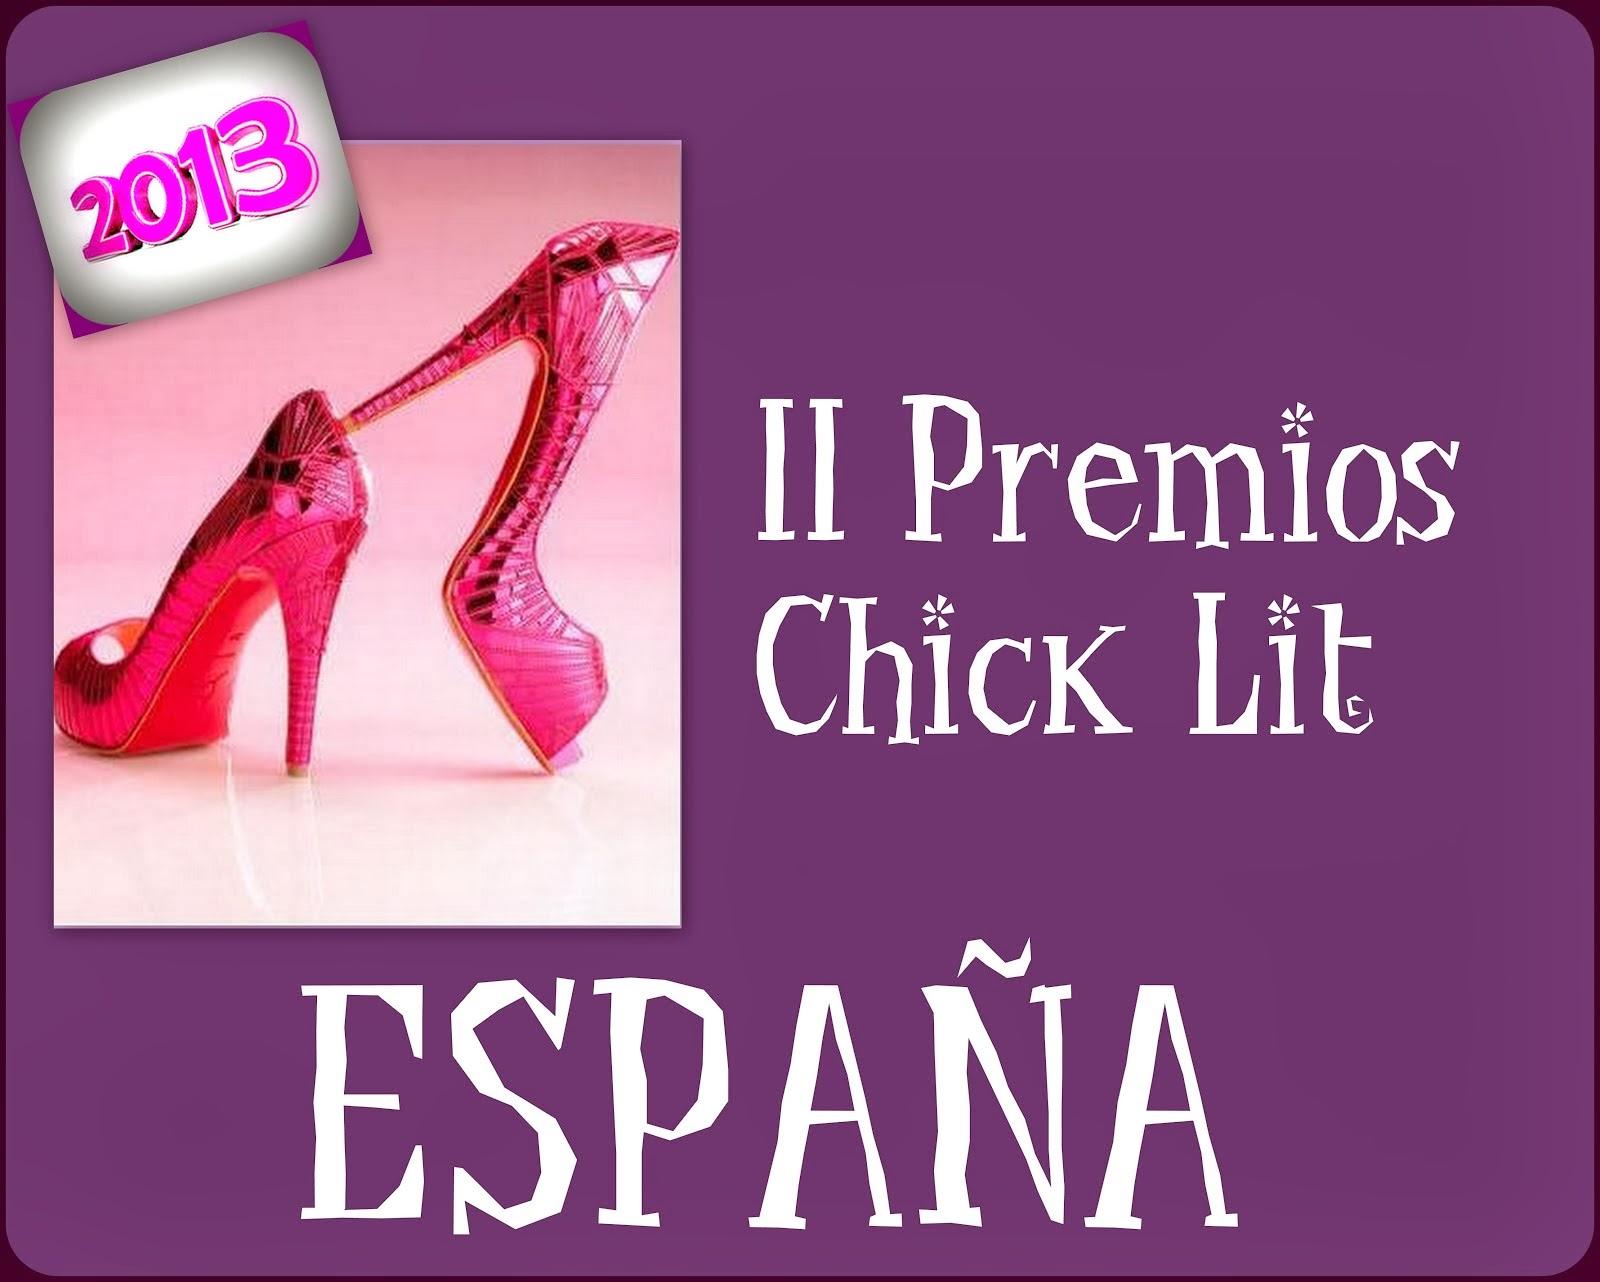 II Premios Chick Lit